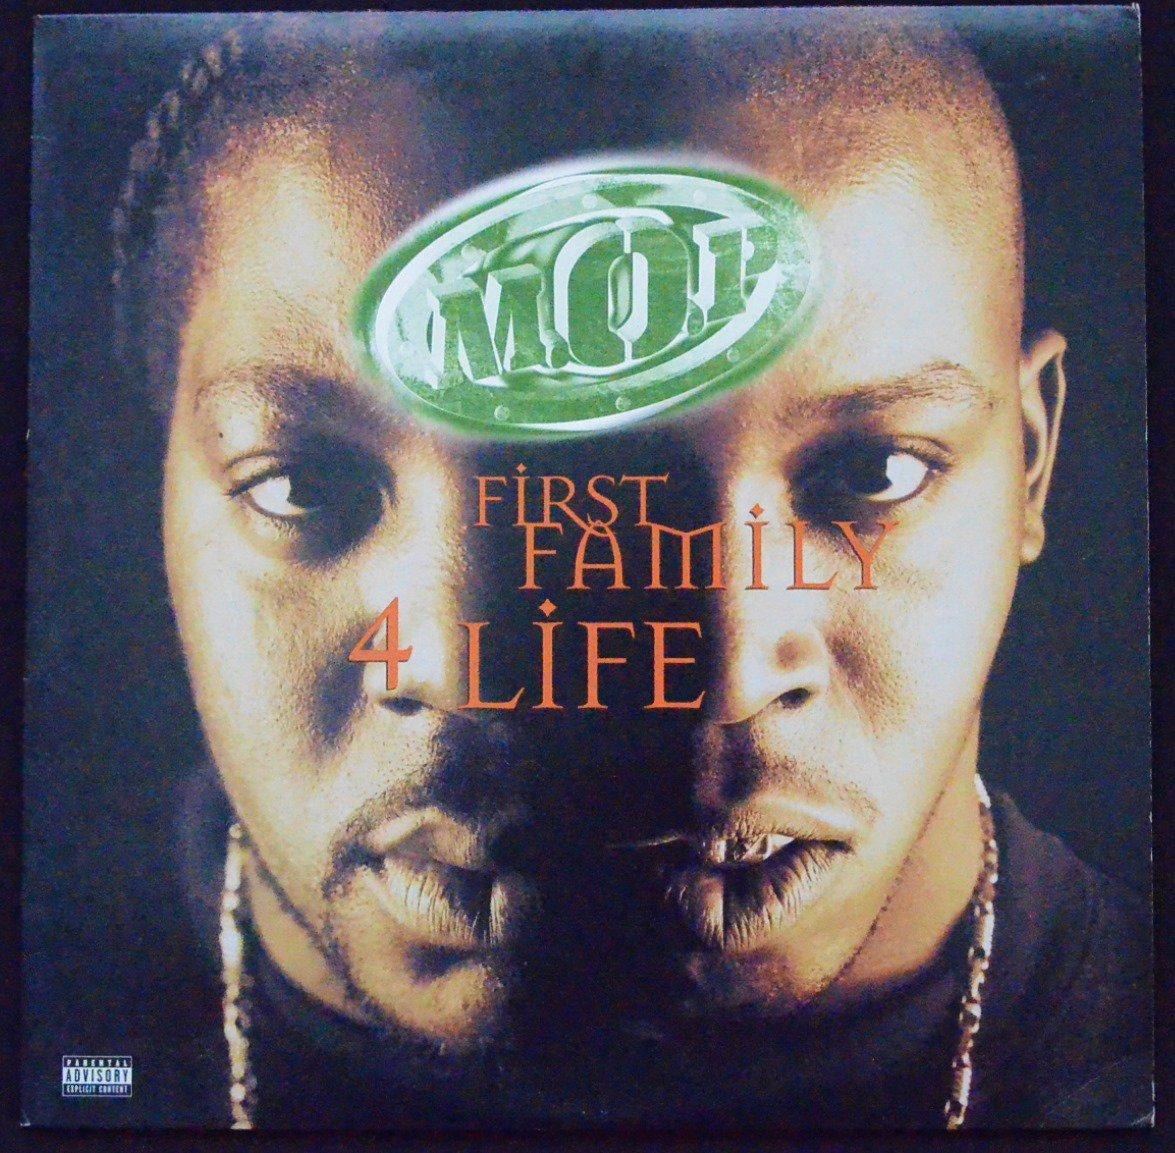 M.O.P. / FIRST FAMILY 4 LIFE (2LP)